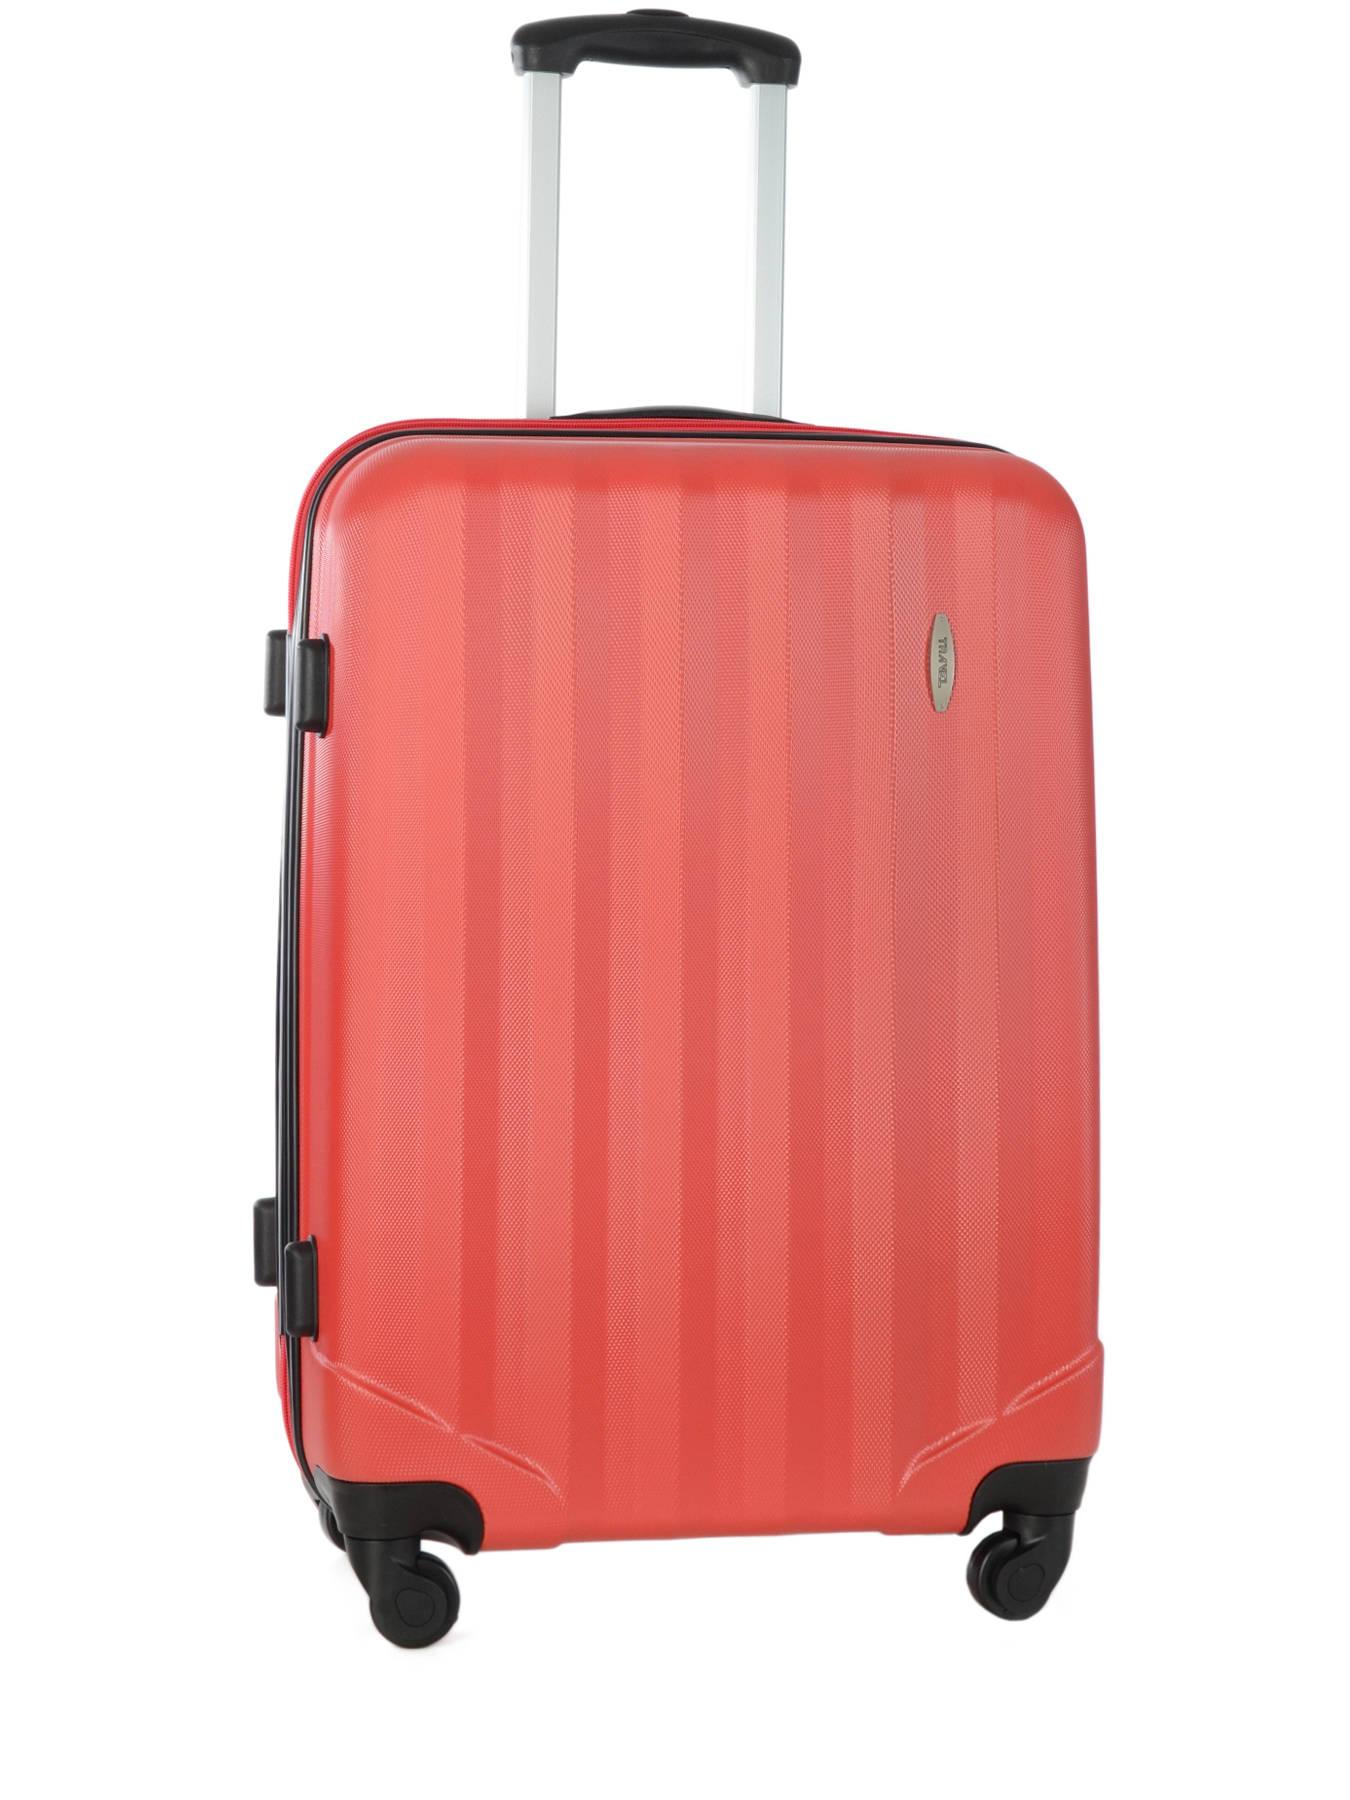 valise rigide travel barcelone raspberry en vente au meilleur prix. Black Bedroom Furniture Sets. Home Design Ideas